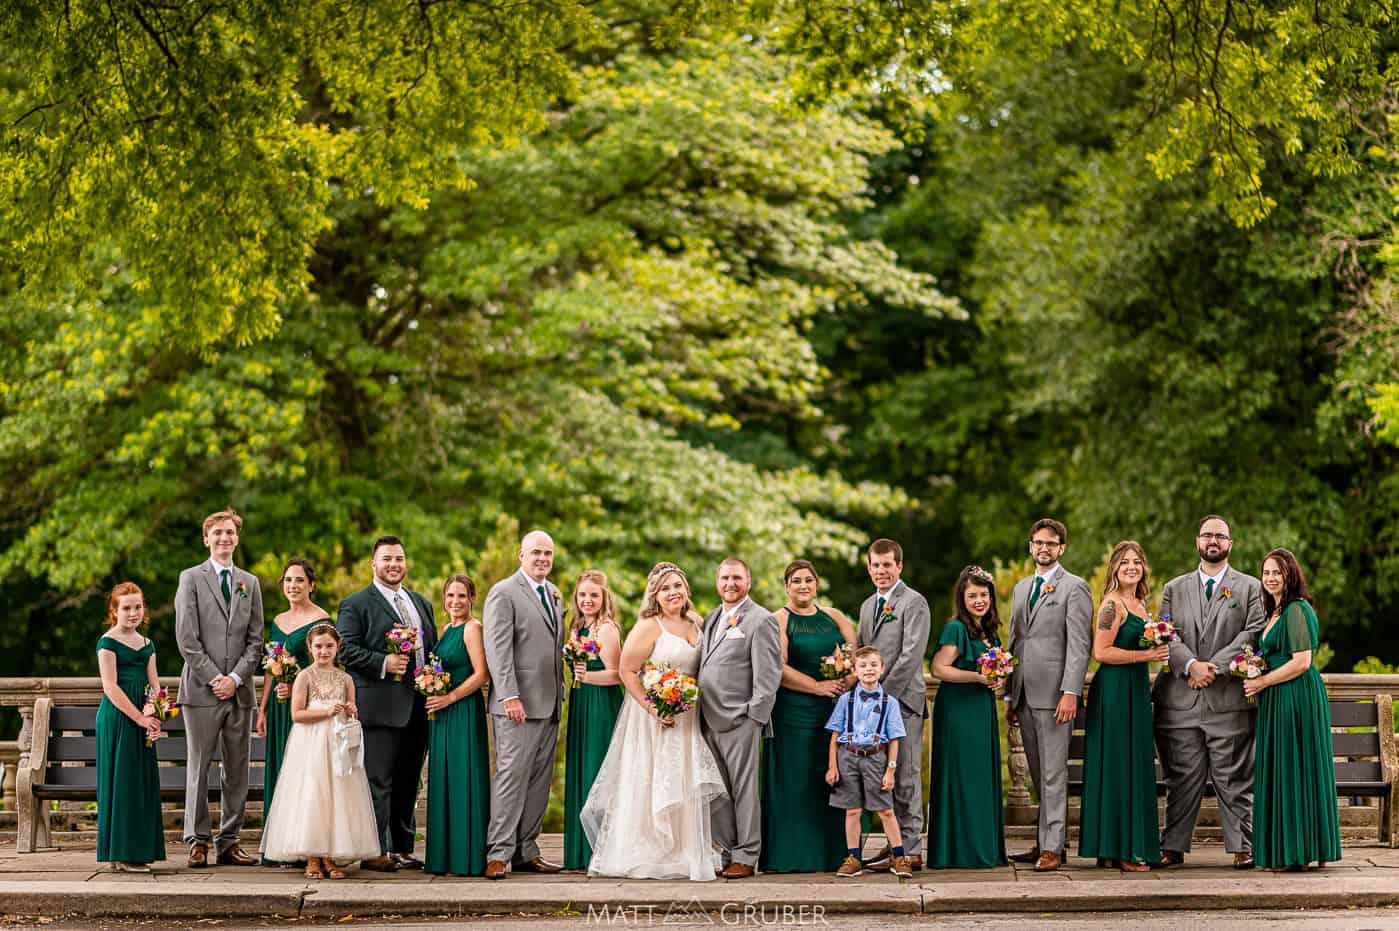 wedding party portrait at Curtis hall arboretum